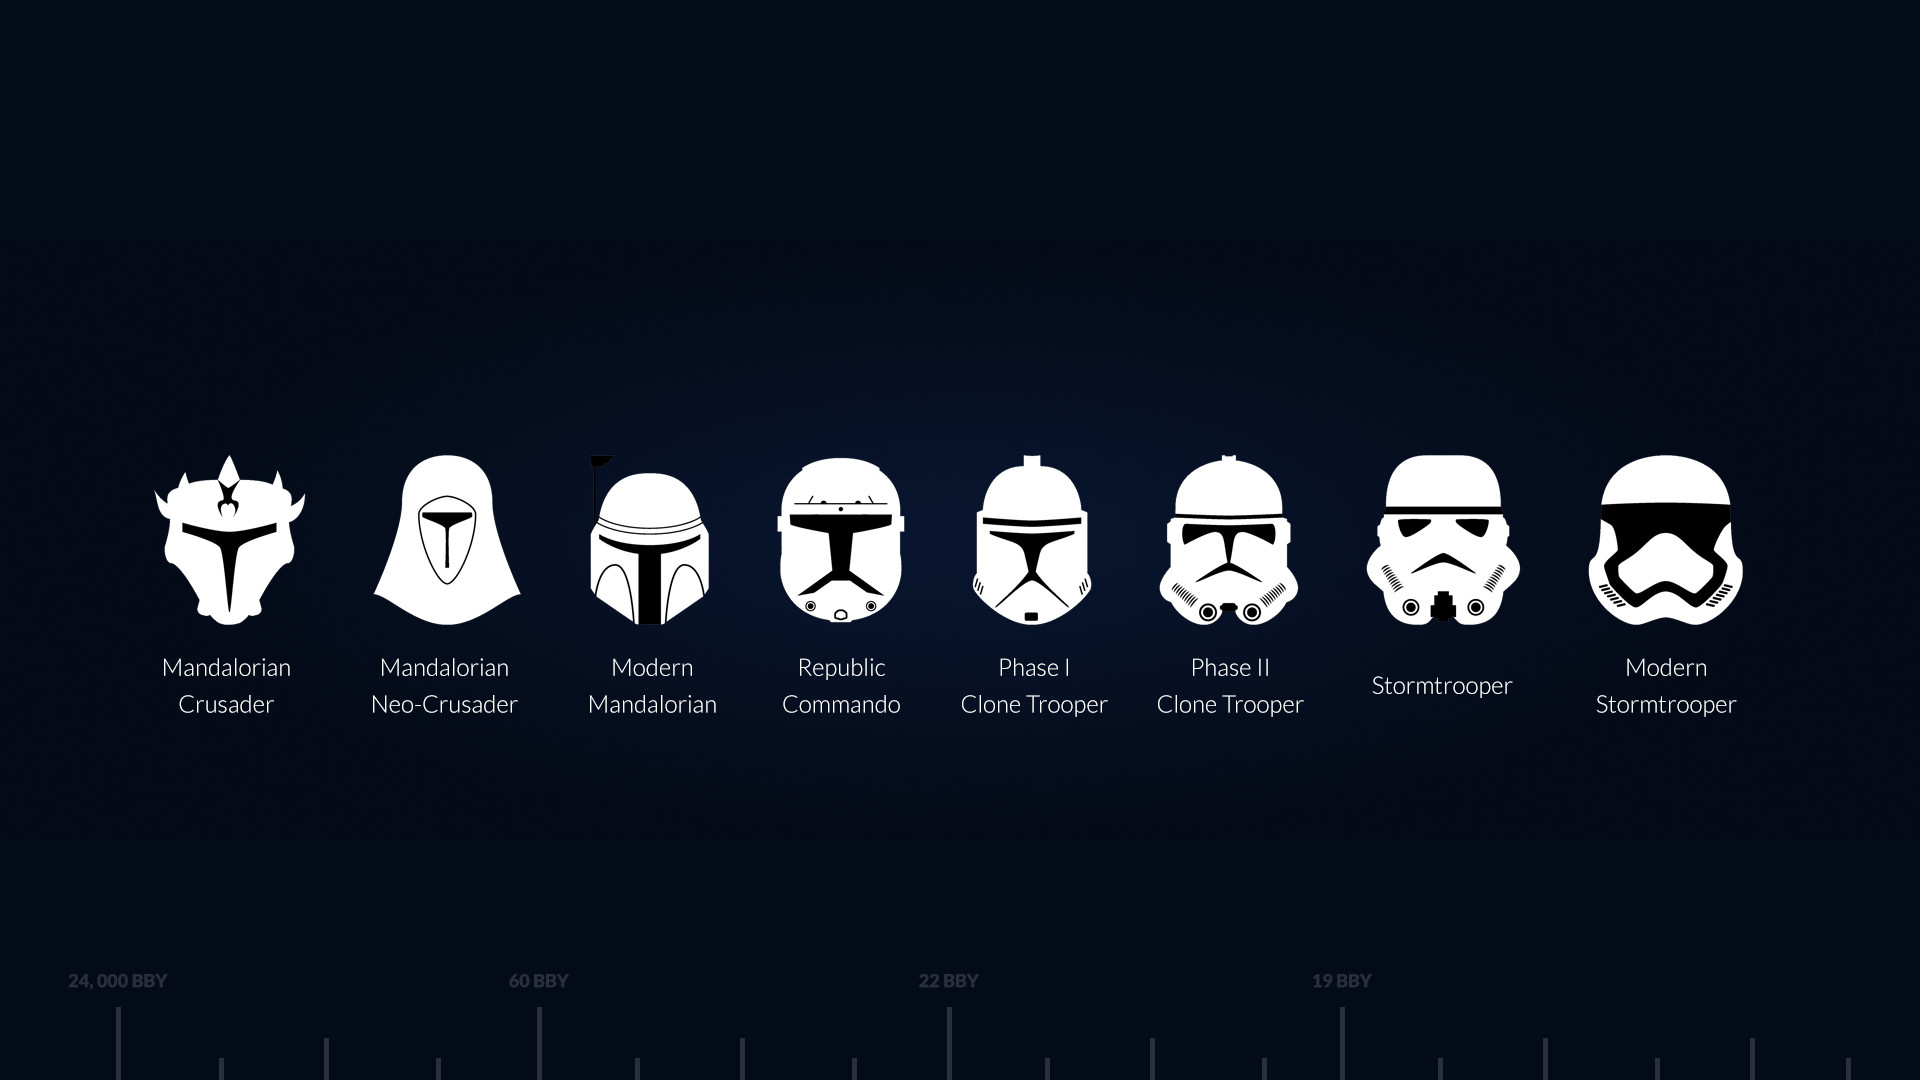 stormtrooper evolution hbd chick 1920x1080